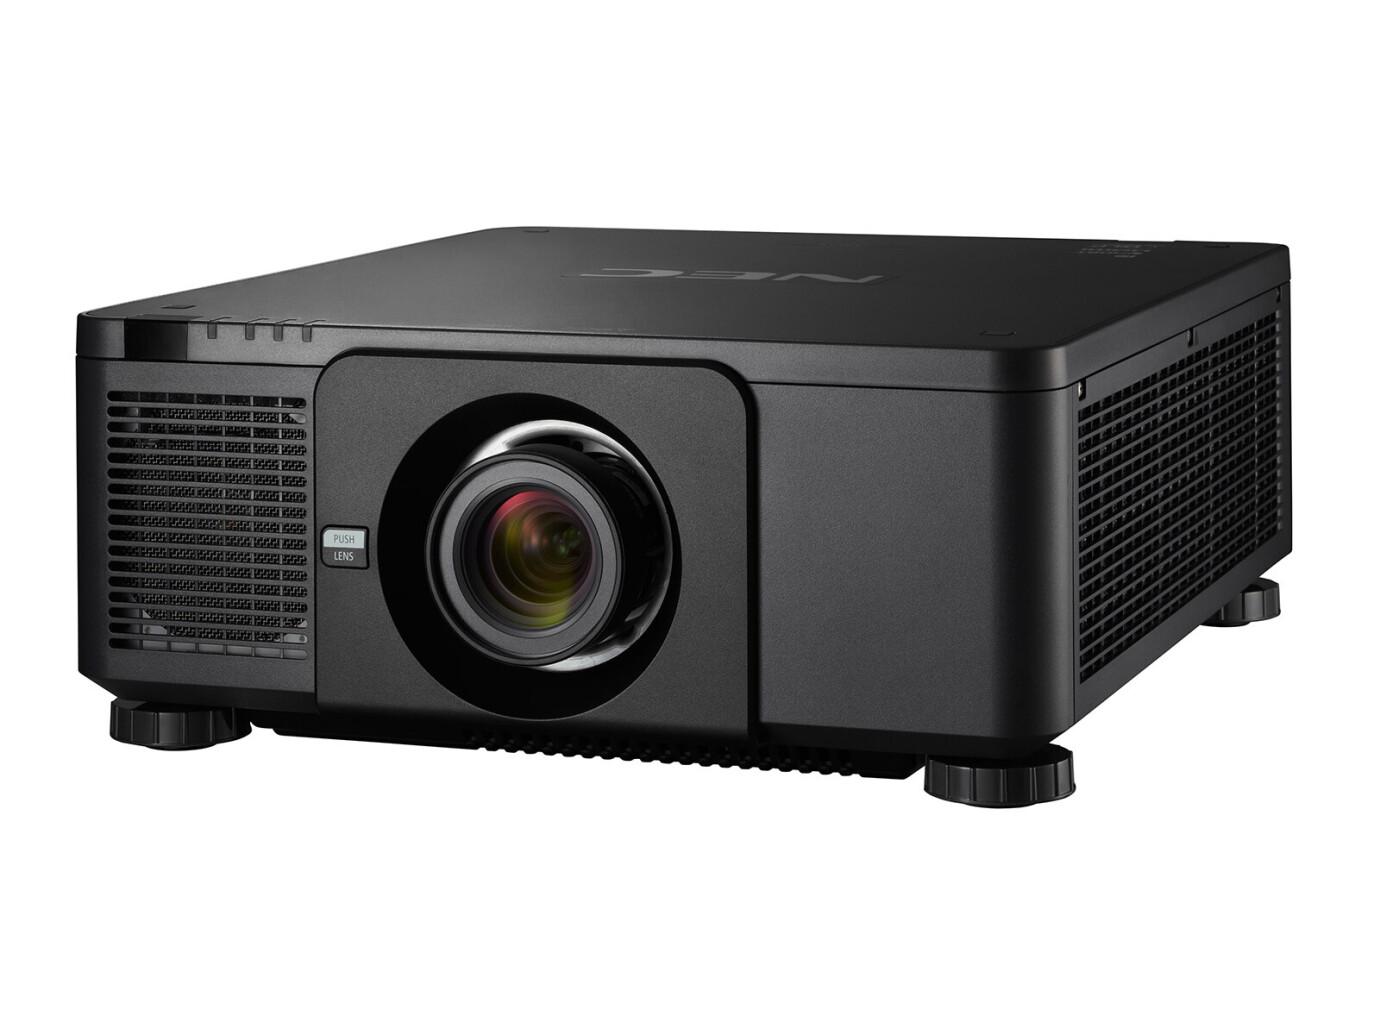 NEC PX803UL-BK (without lens)